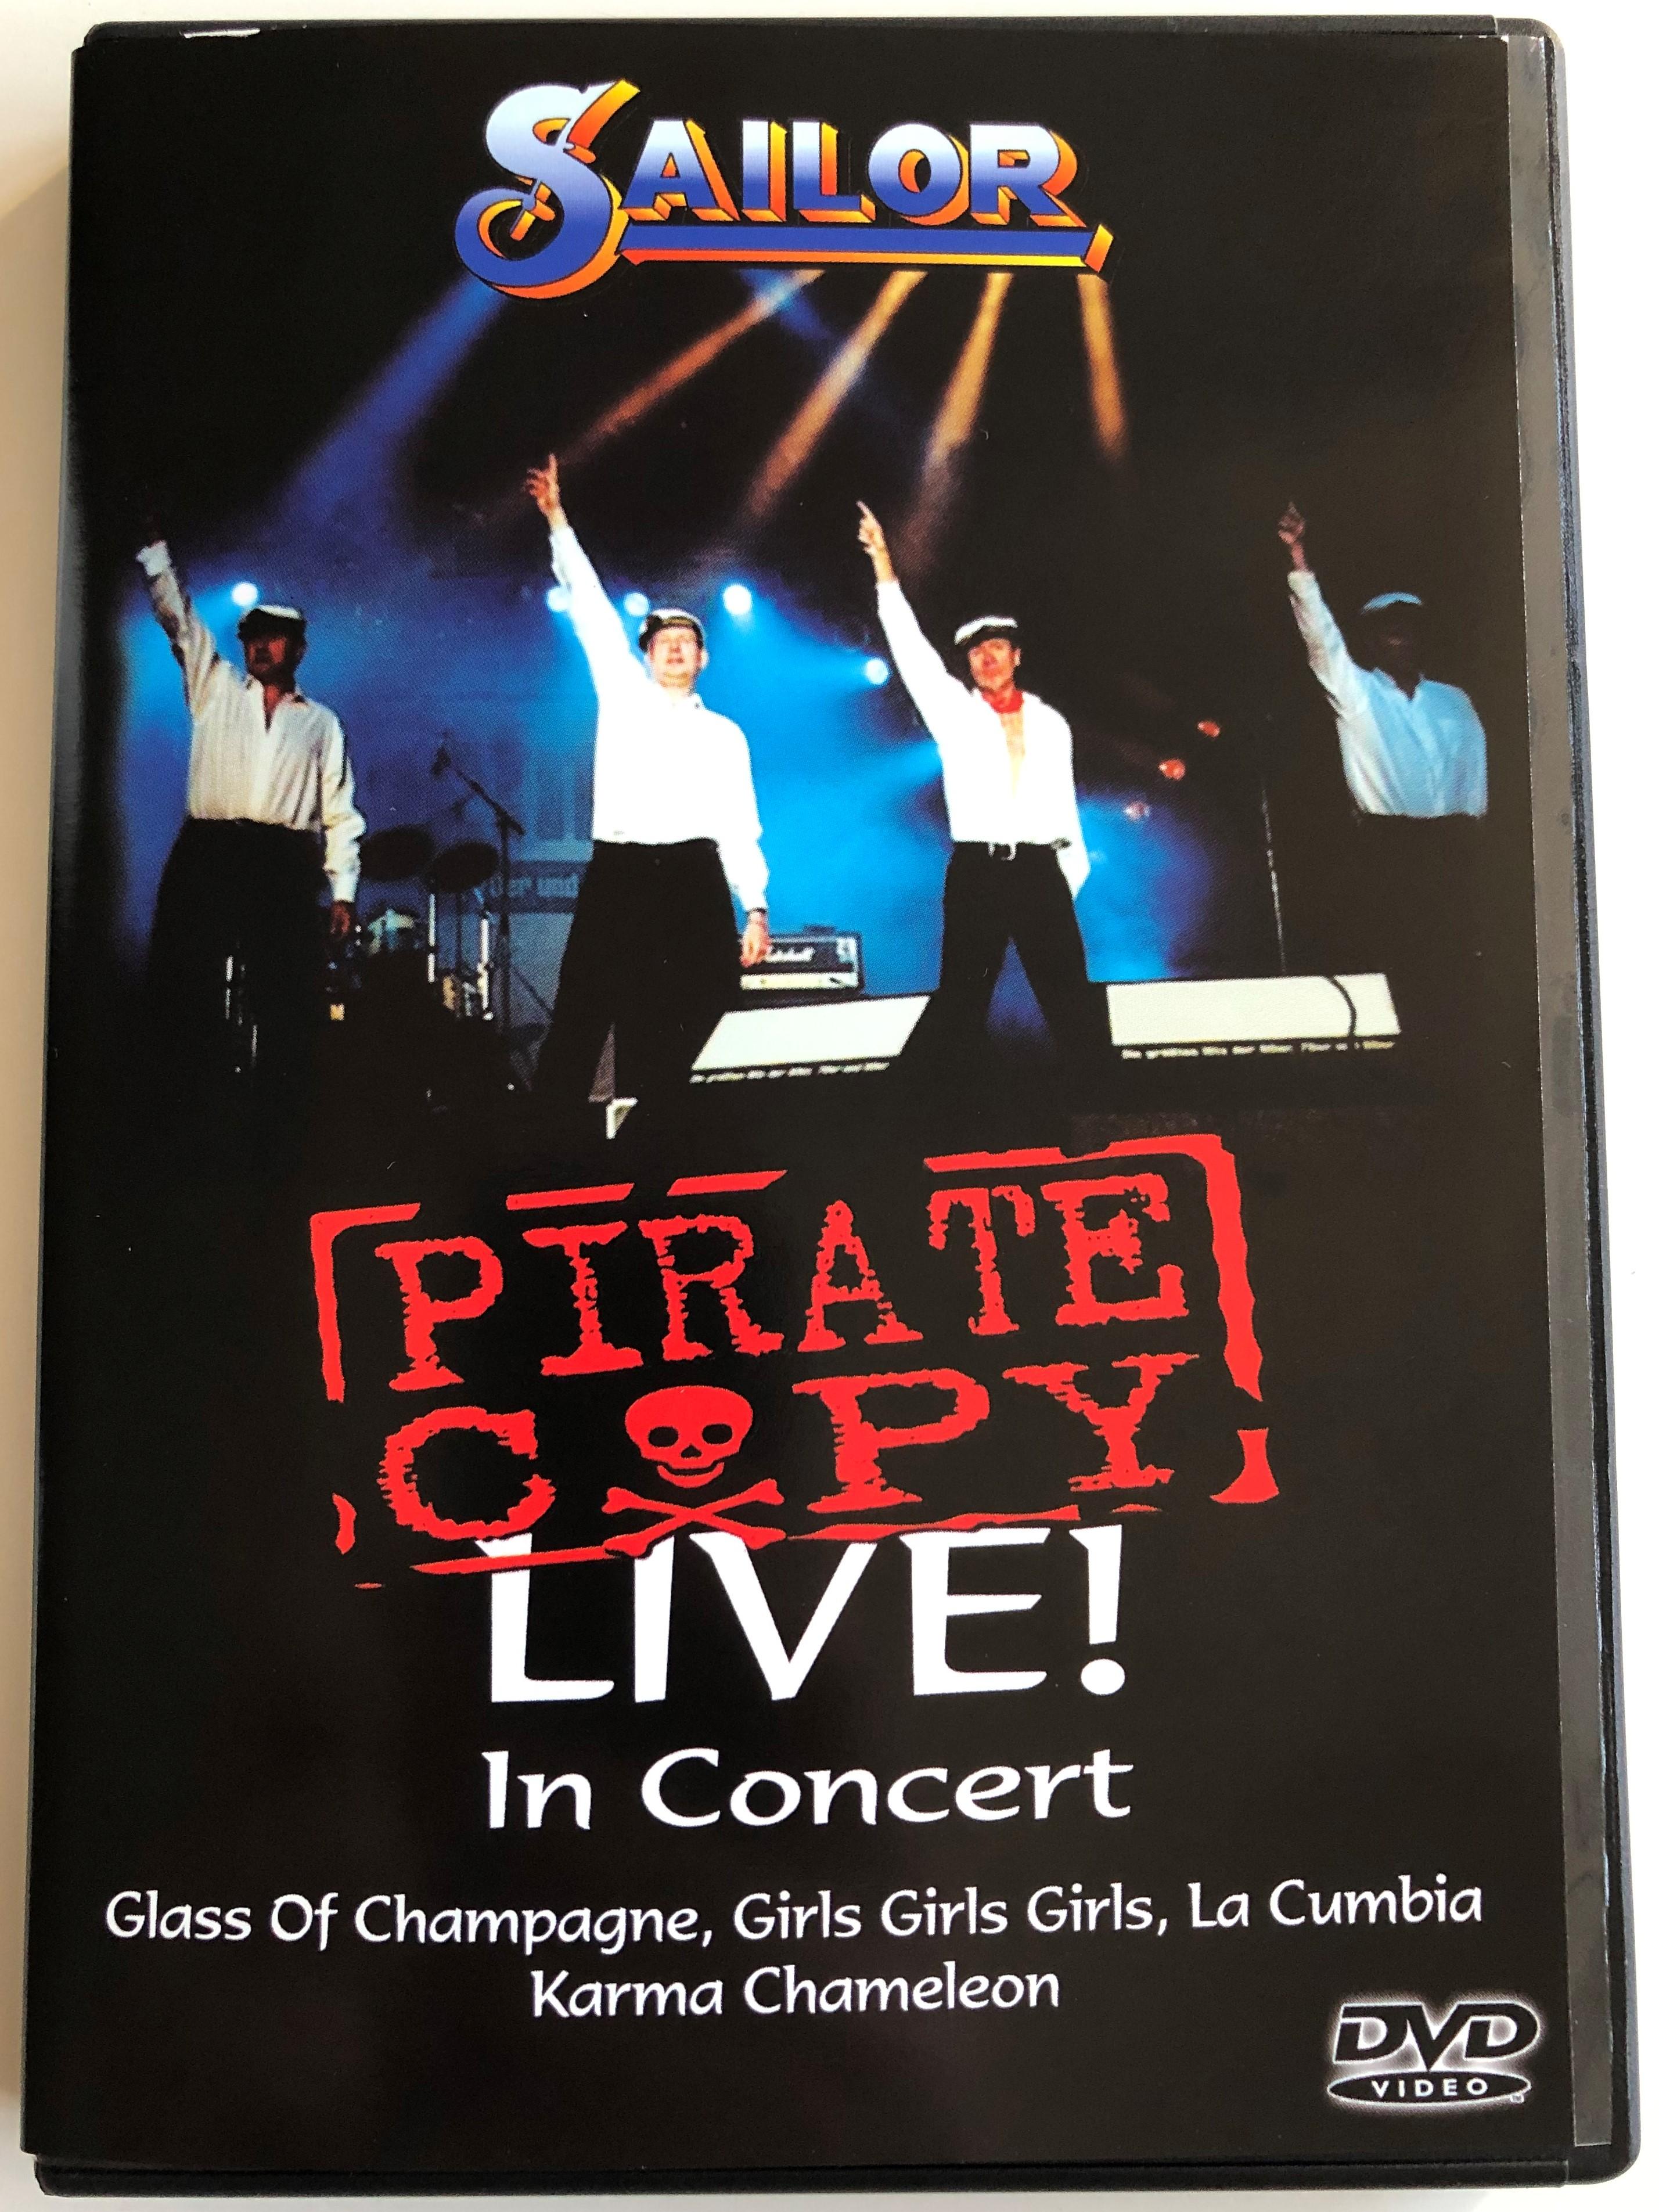 sailor-pirate-copy-live-in-concert-dvd-2003-glass-of-champagne-girls-girls-girls-la-cumbia-1.jpg